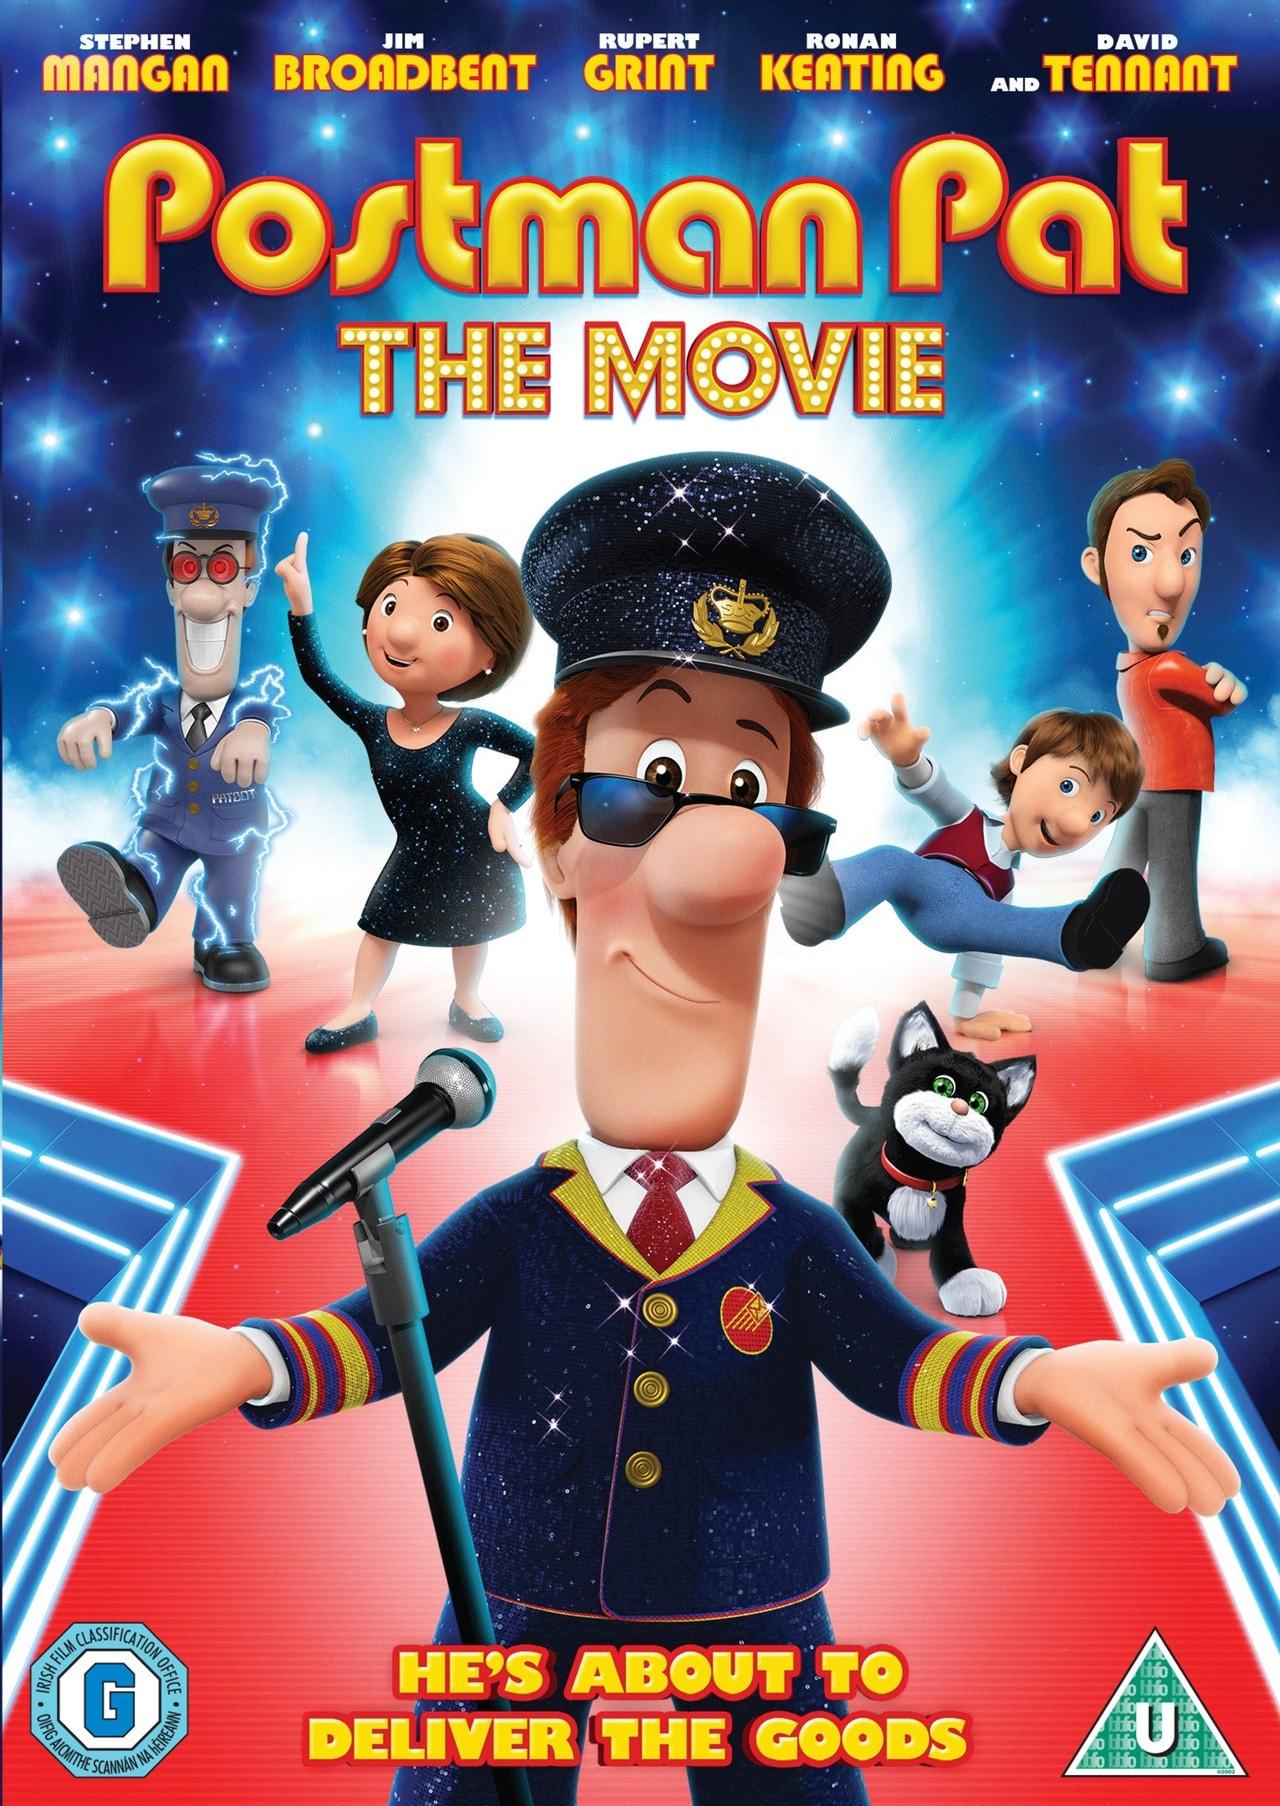 Postman Pat: The Movie - 1